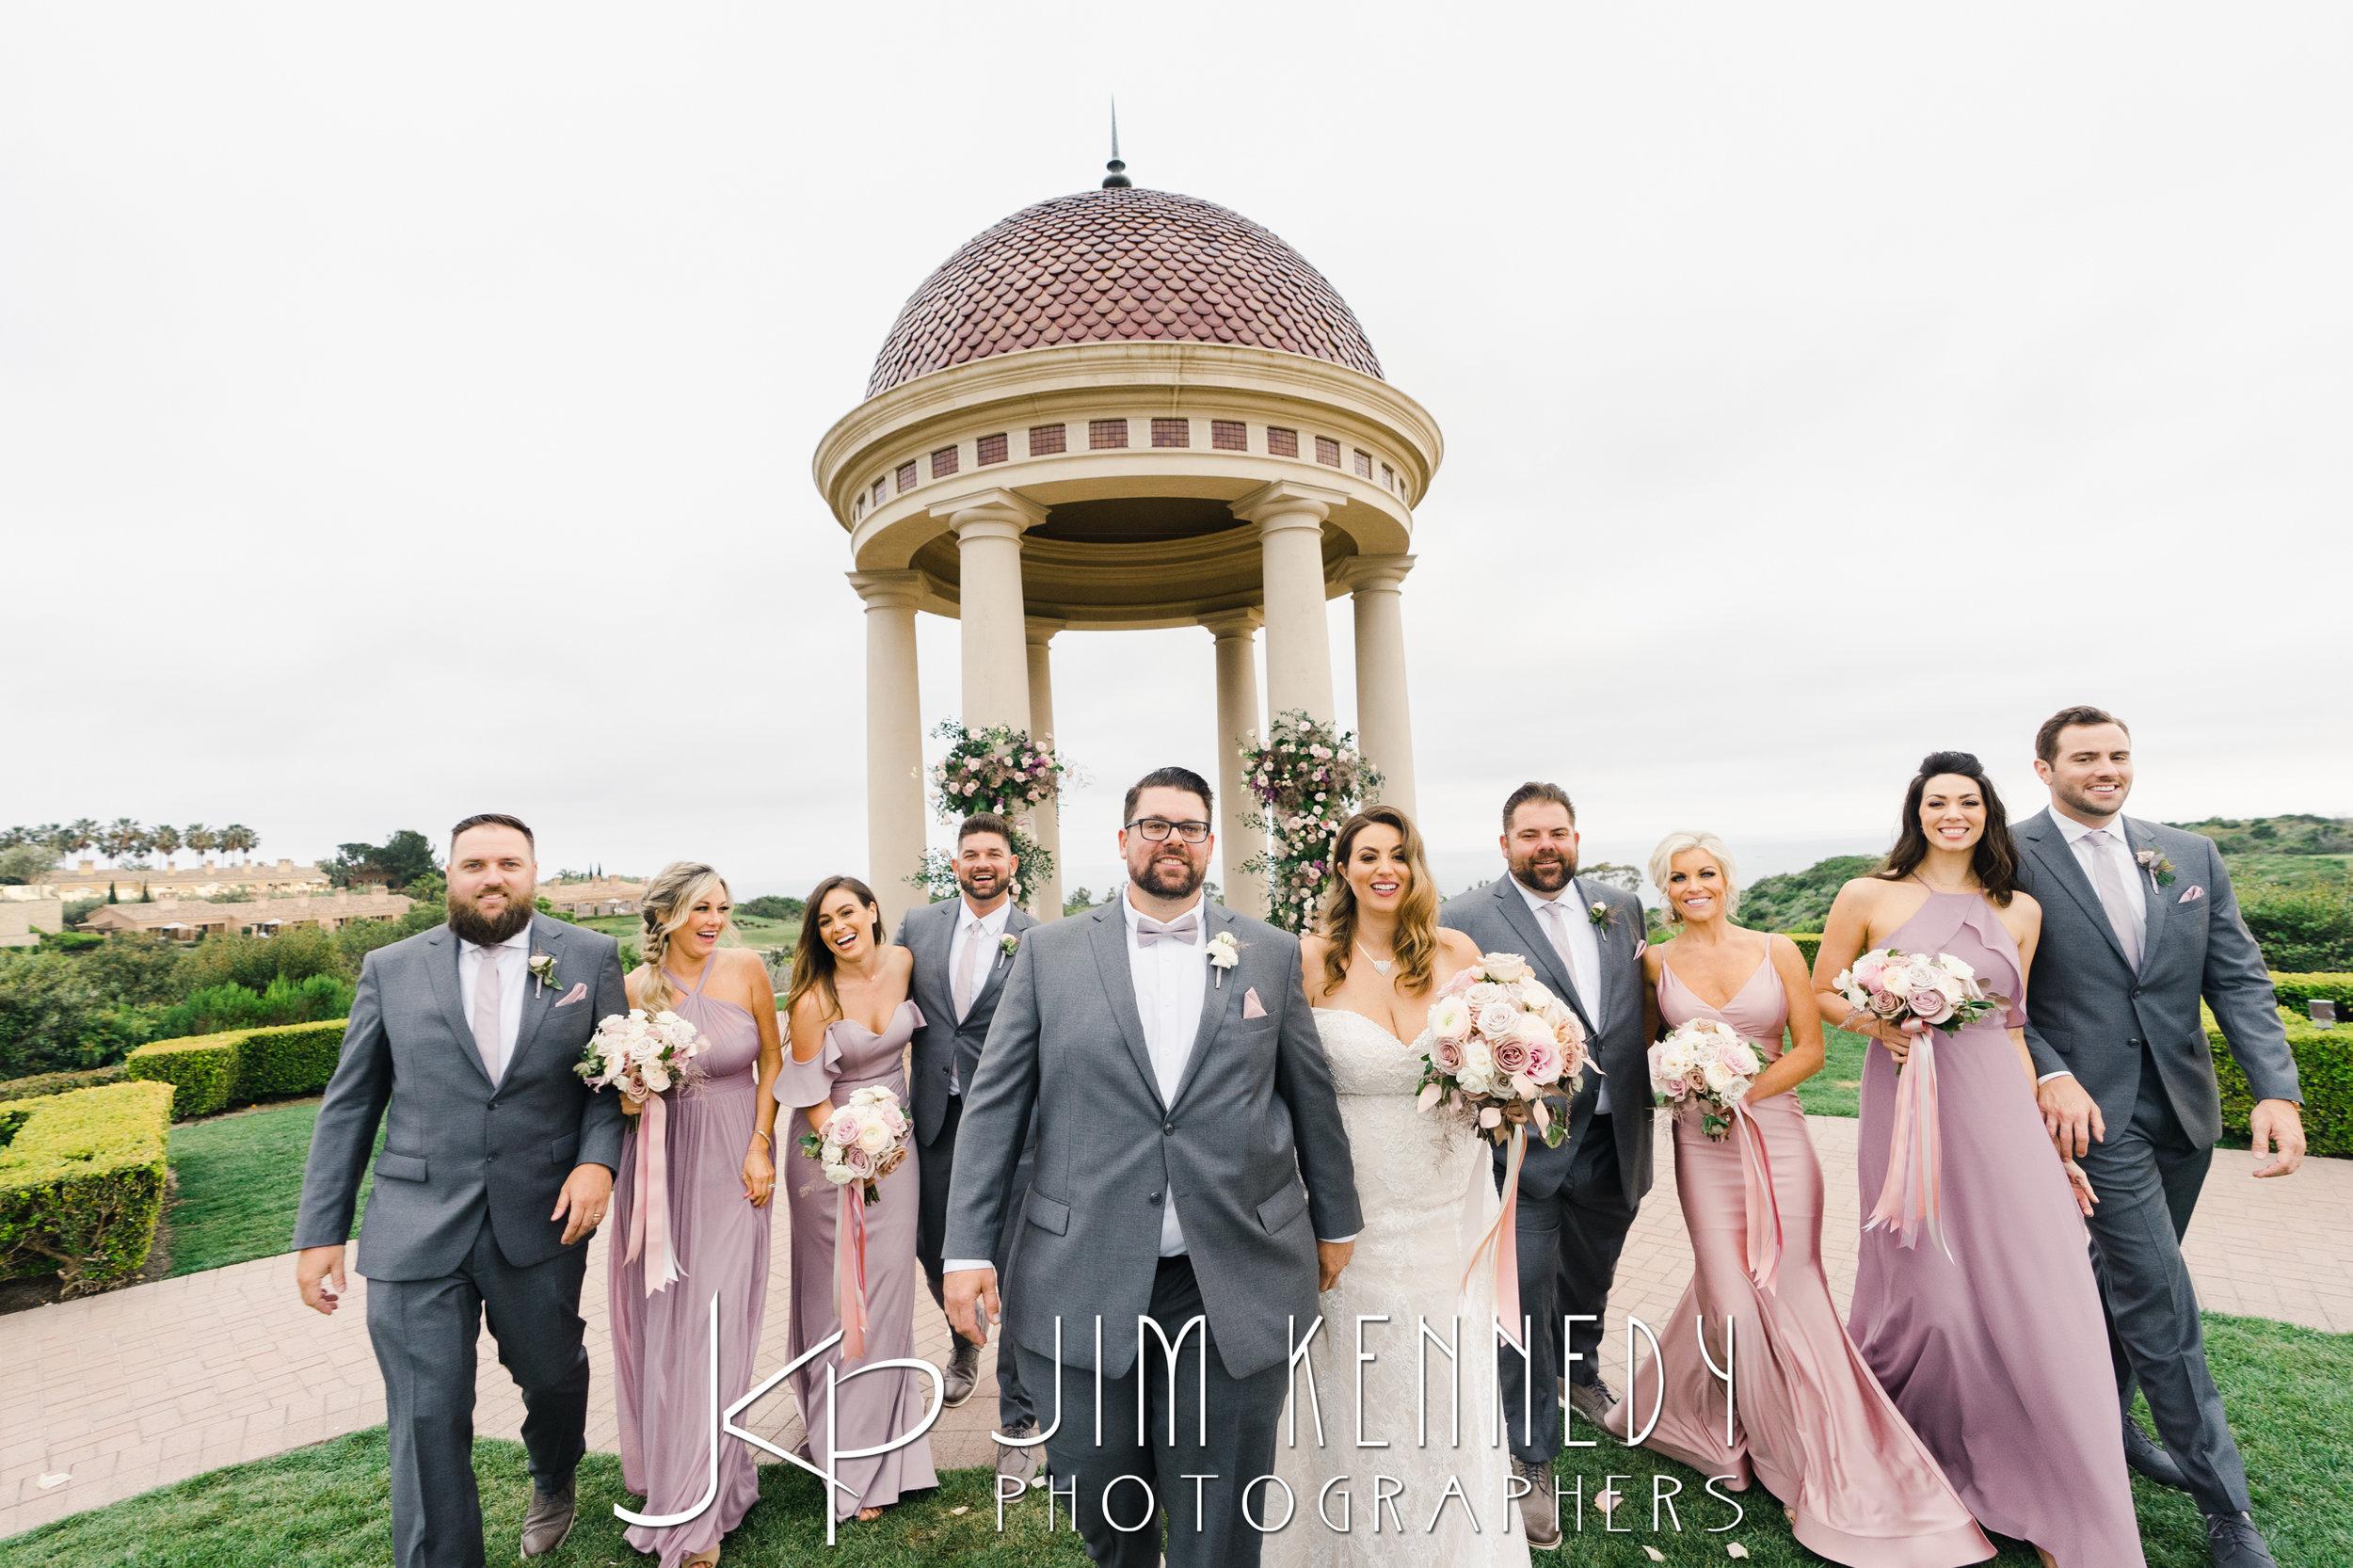 pelican-hill-wedding-jim-kenedy-photographers_0155.JPG